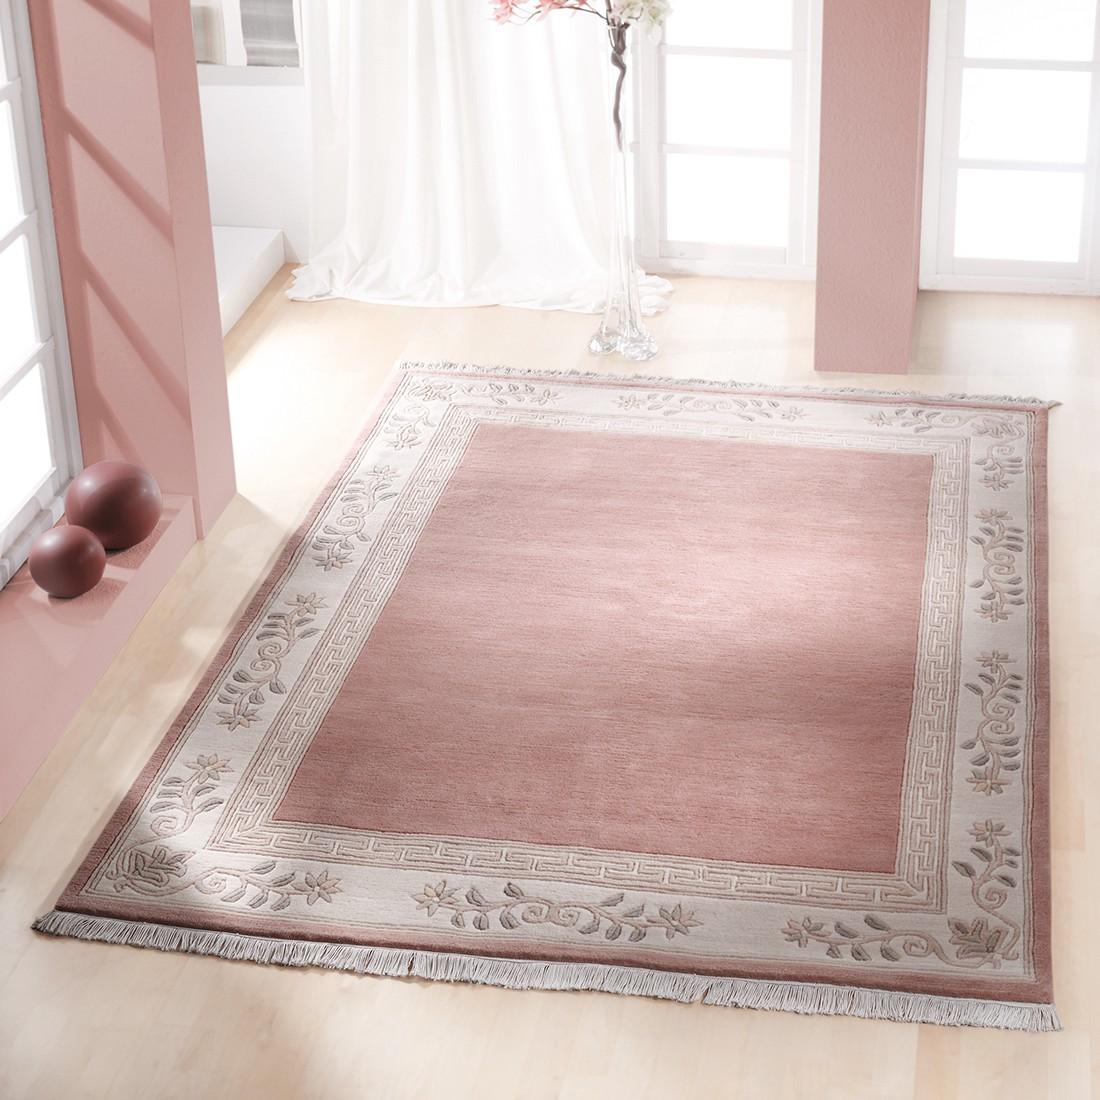 Teppich Floral – AltRosé – 120 x 180 cm, Luxor living jetzt bestellen